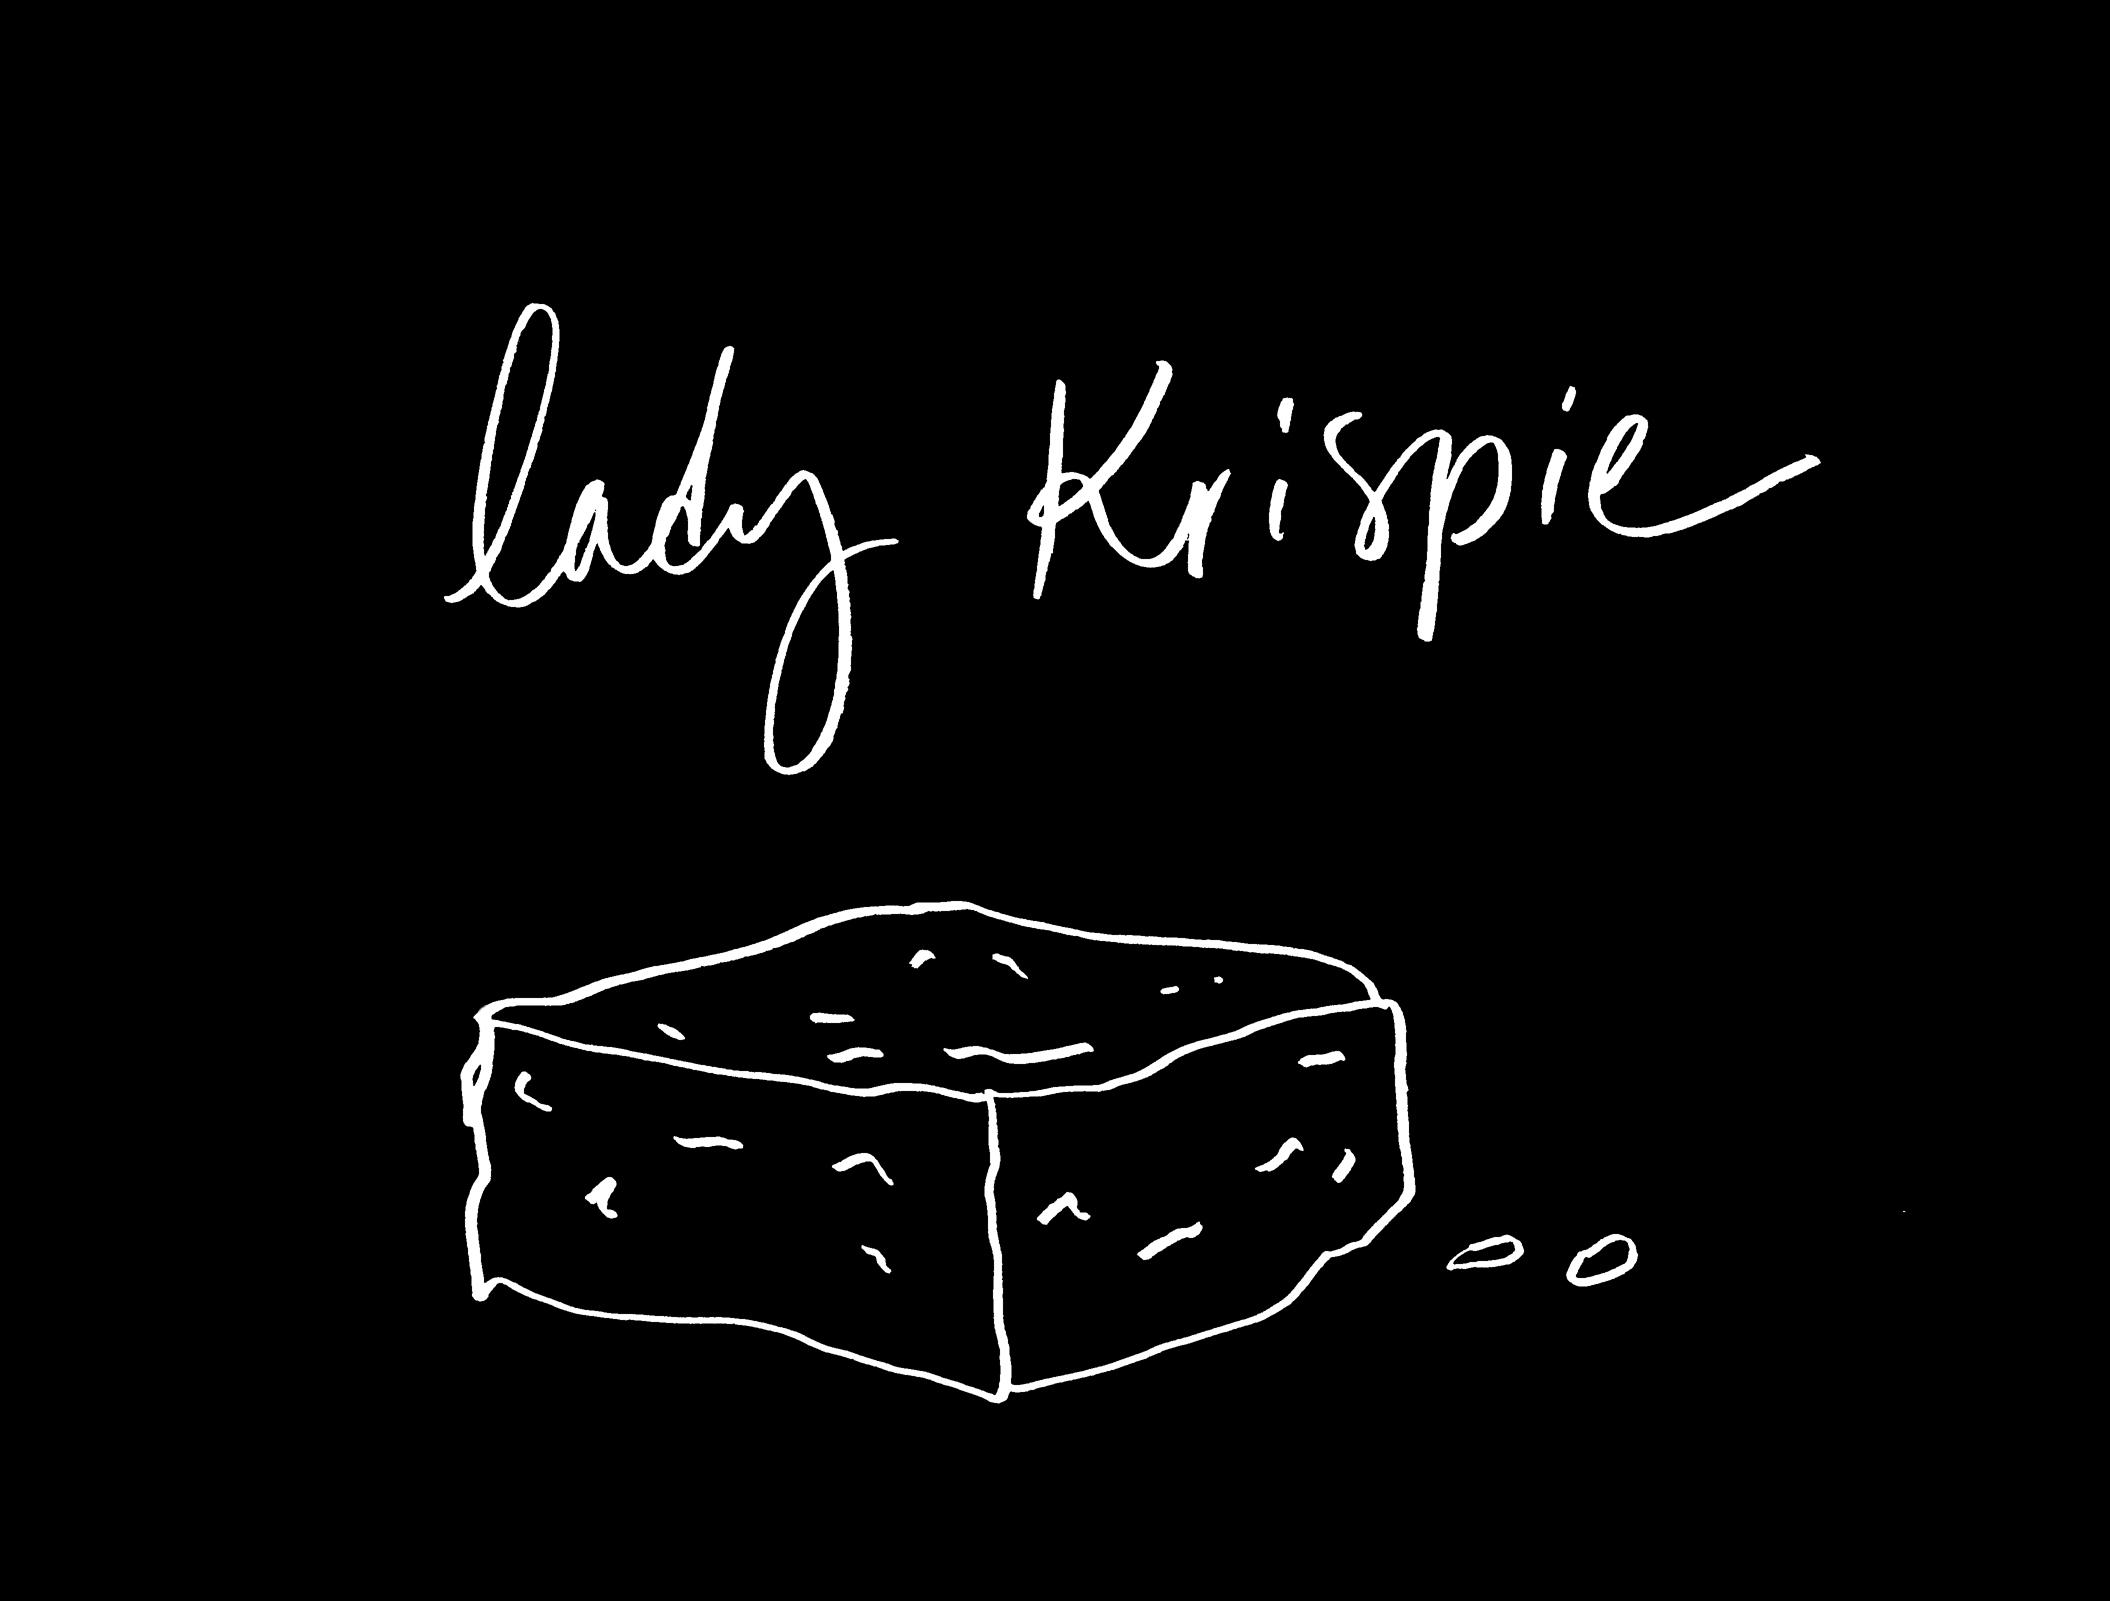 ladykrispie_invert.jpg